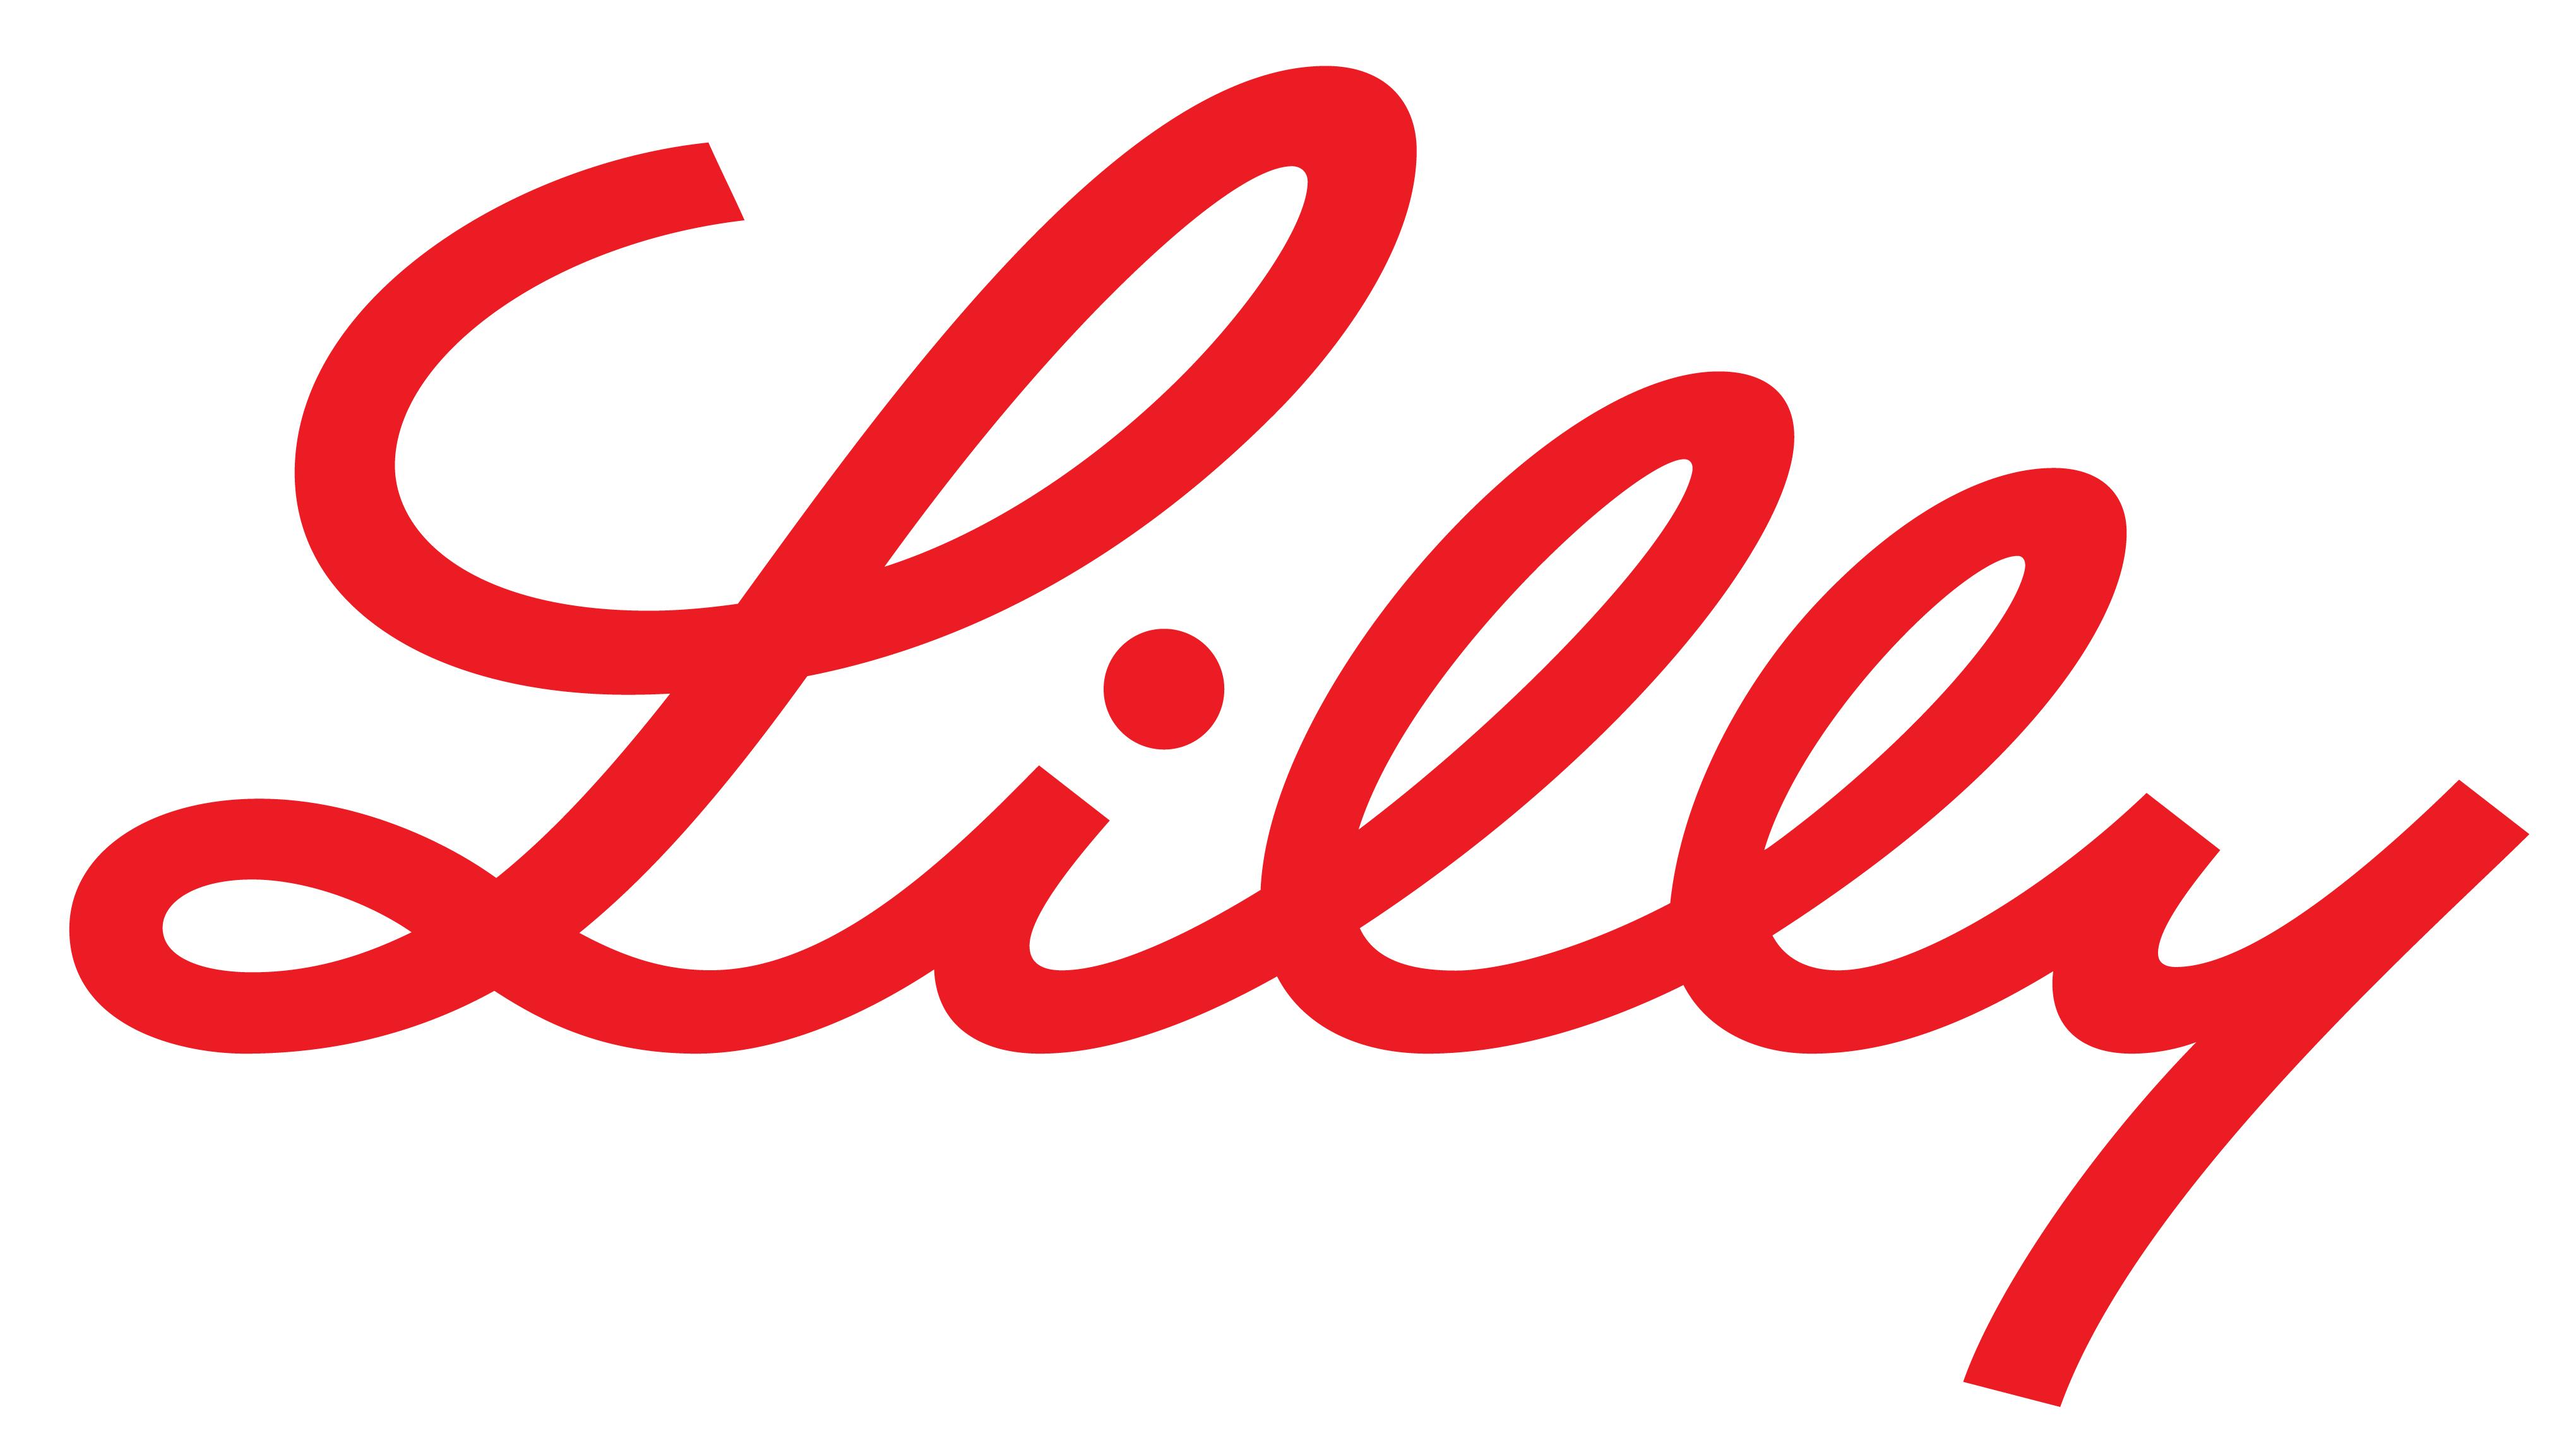 Lilly logo